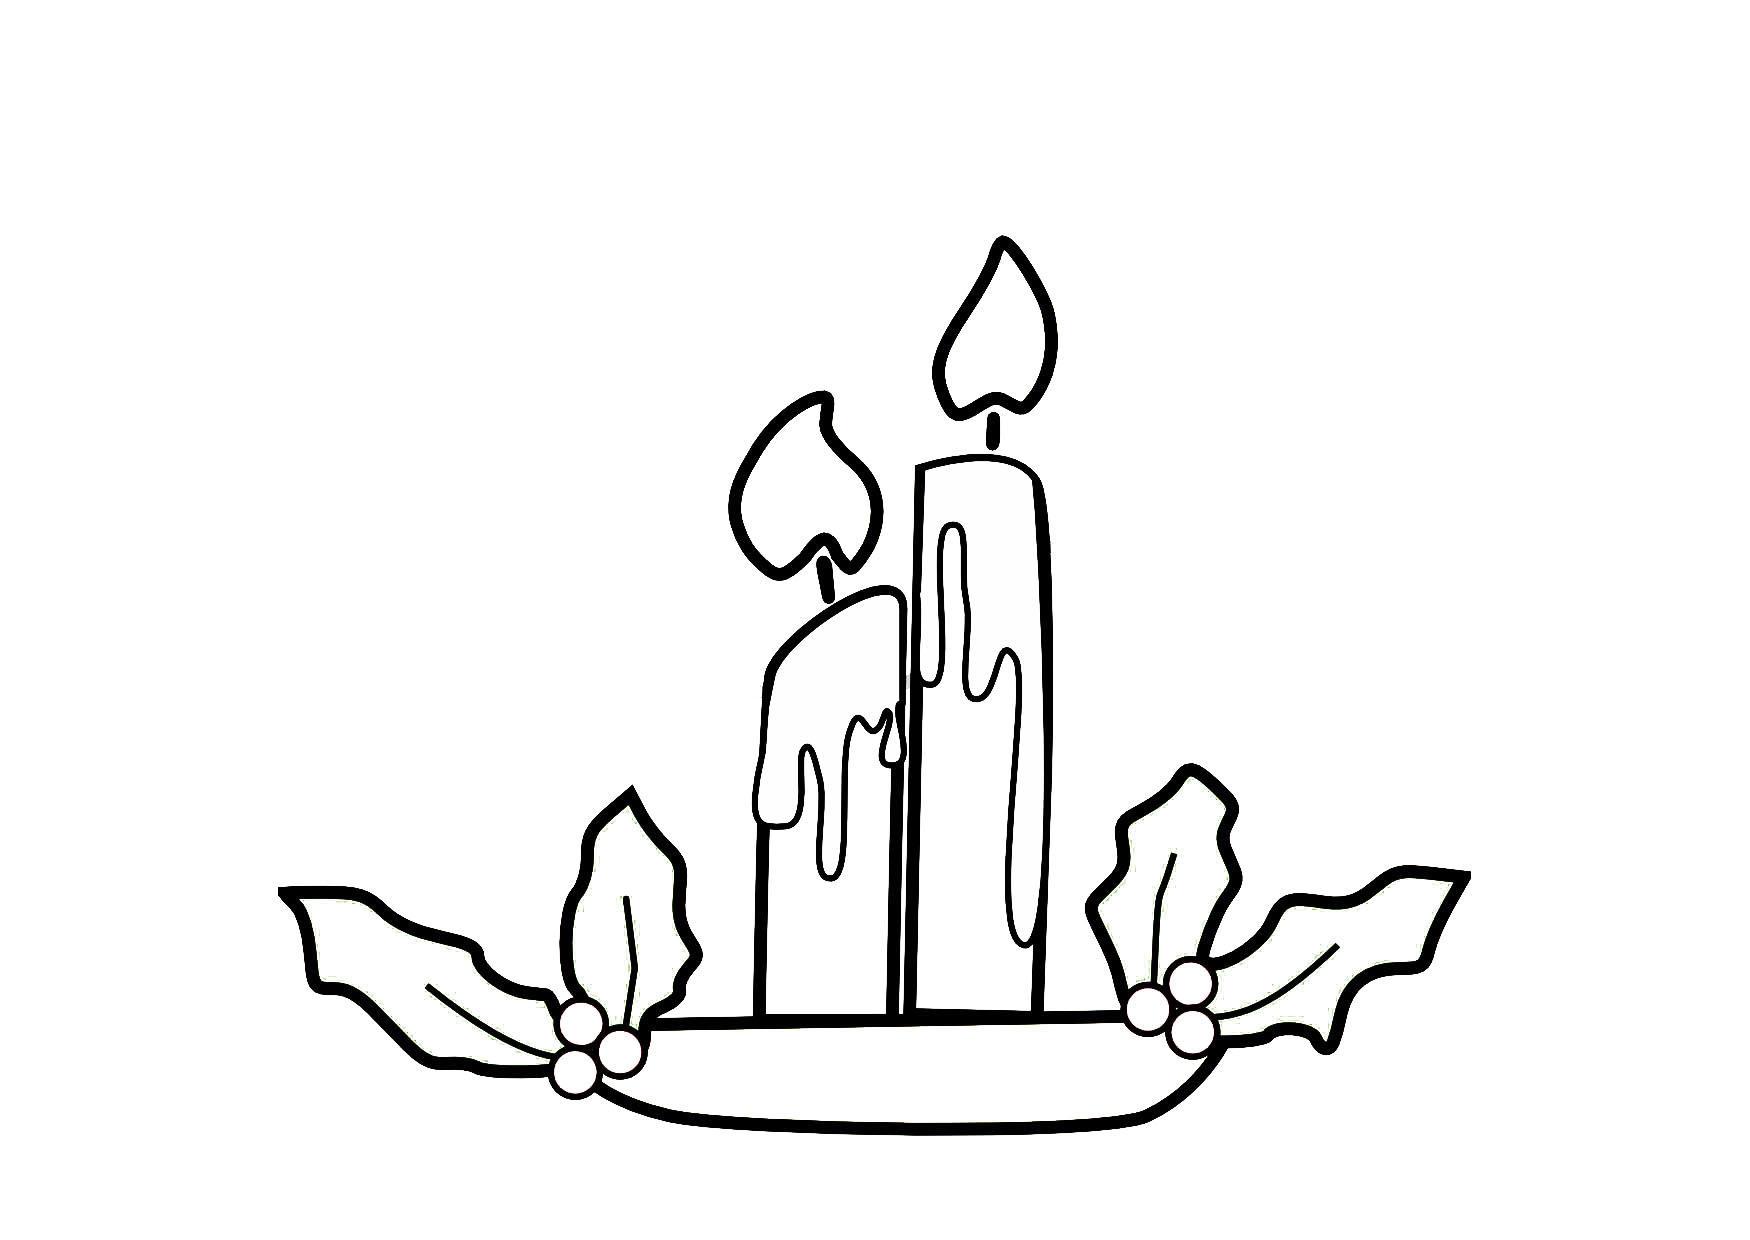 coloriage bougies de no l img 9141. Black Bedroom Furniture Sets. Home Design Ideas